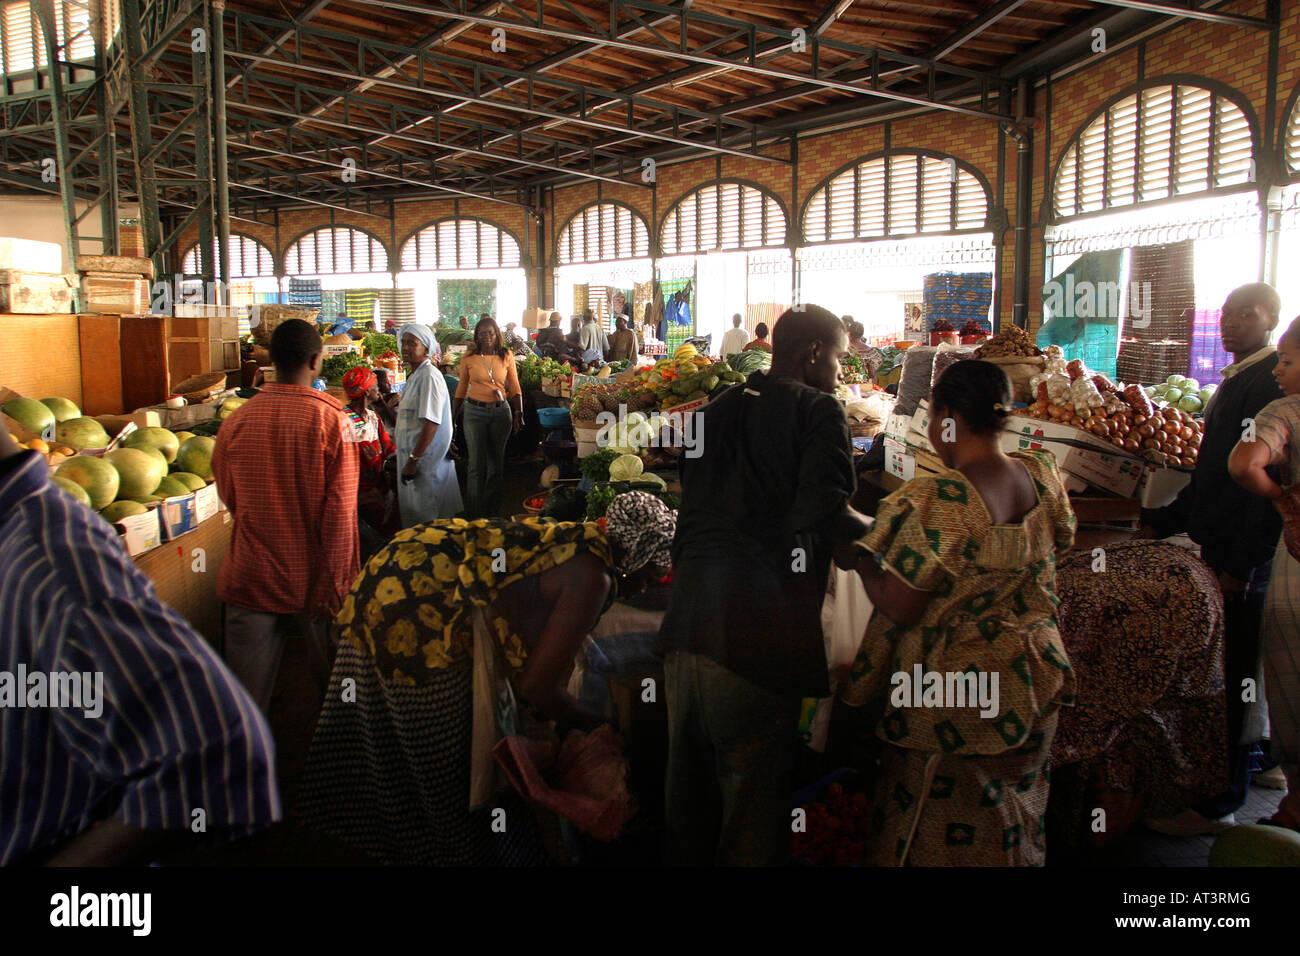 Senegal Dakar Central Marche Kermel Market interior Stock Photo, Royalty Free Image: 16192863